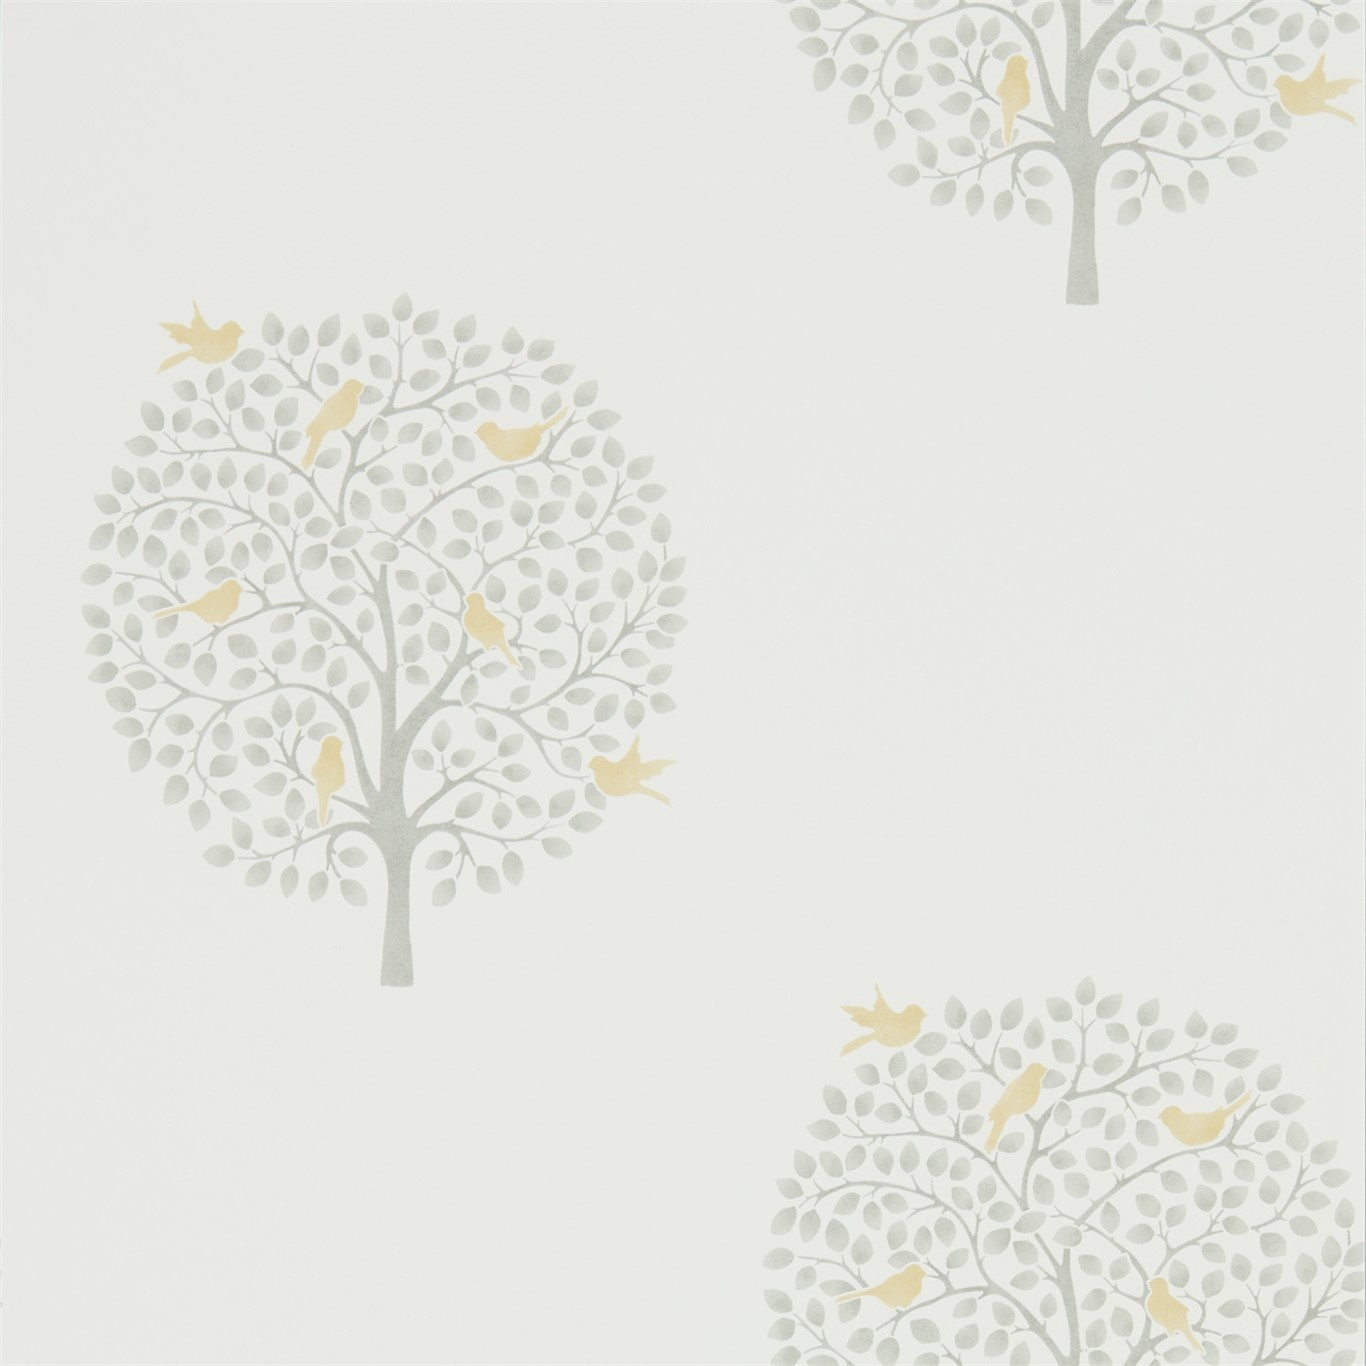 Image of Sanderson Home Bay Tree Dijon/Mole Wallpaper 216360